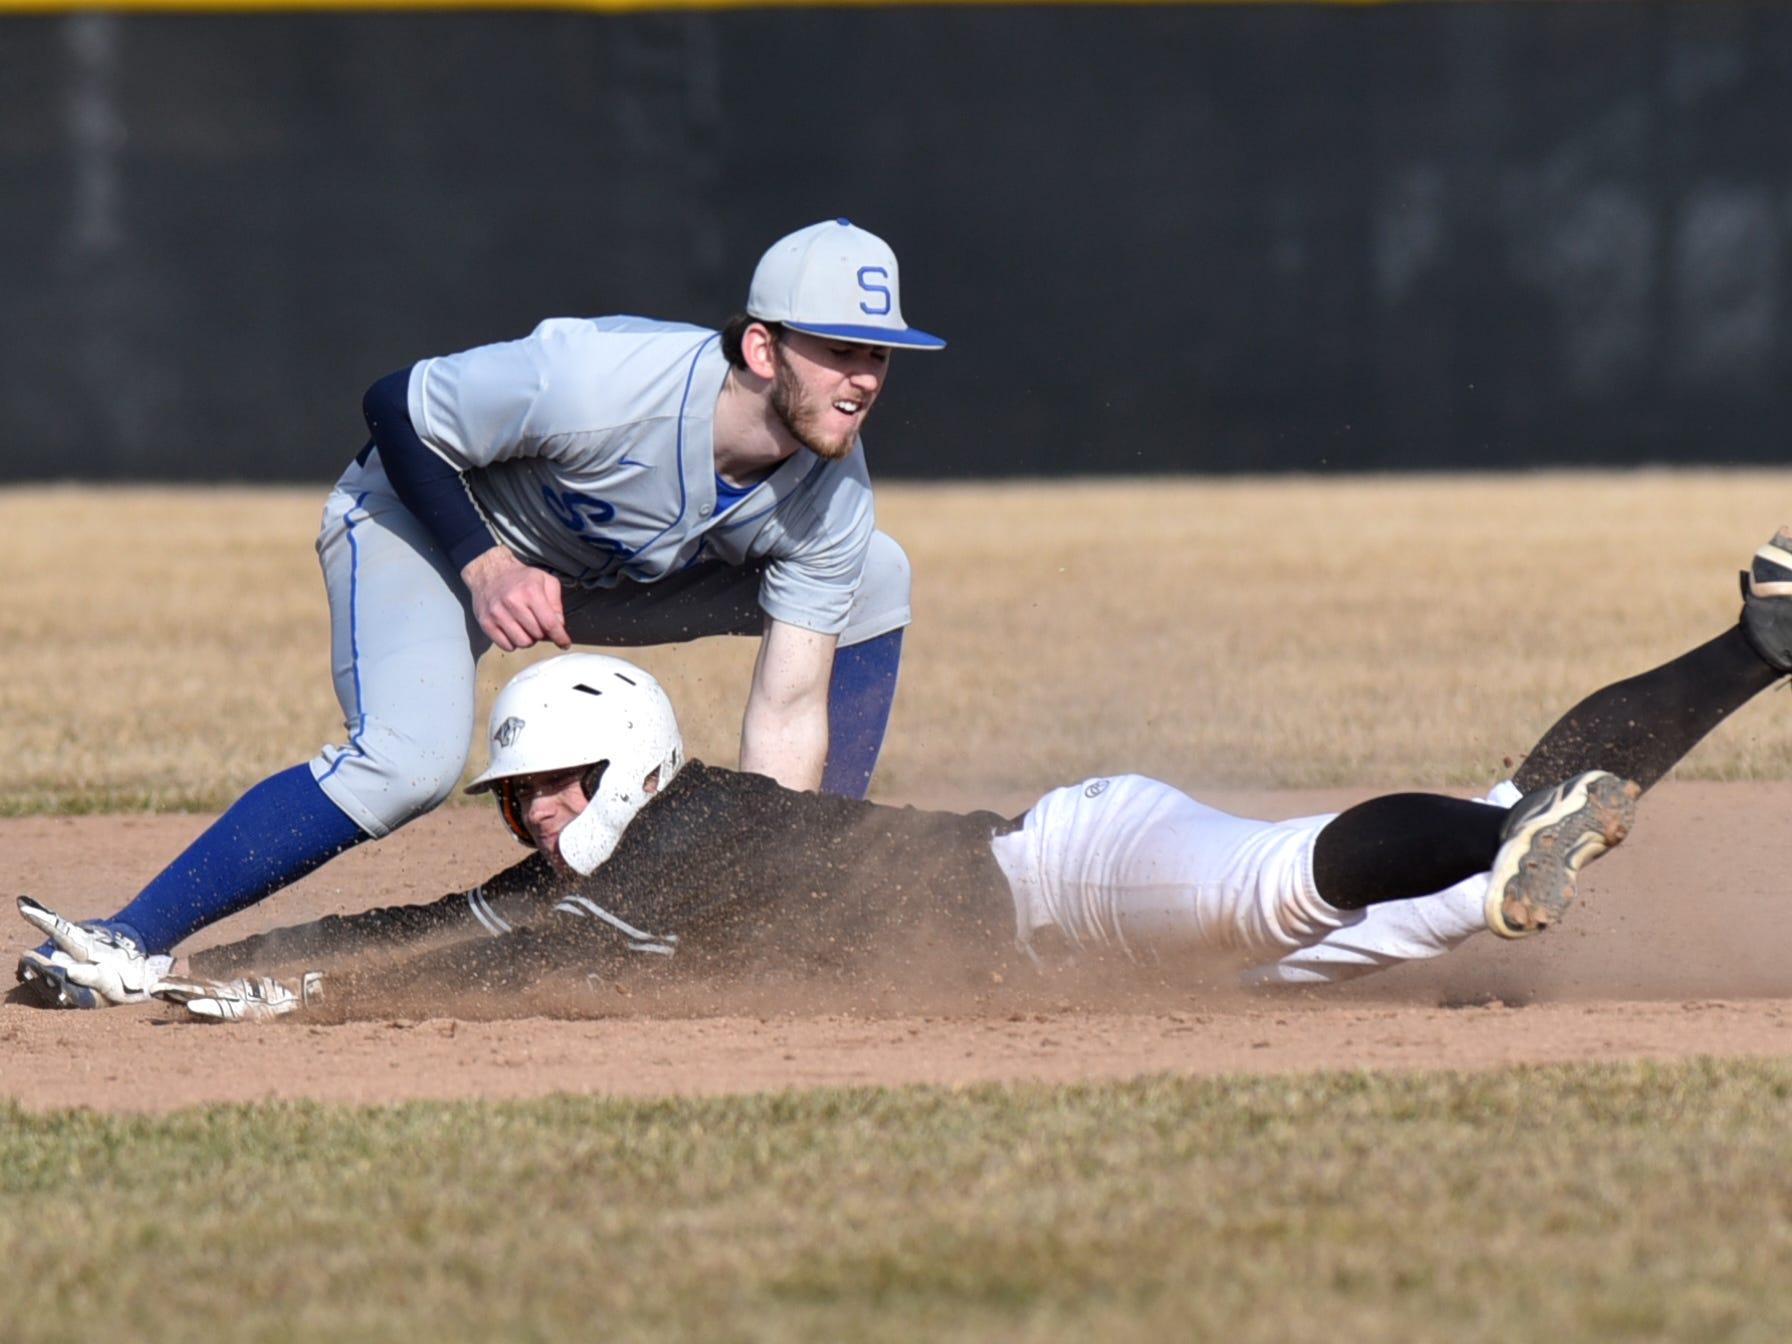 Salem's Jacob Amato tags out Plymouth Wildcat Nick Koski at second base.